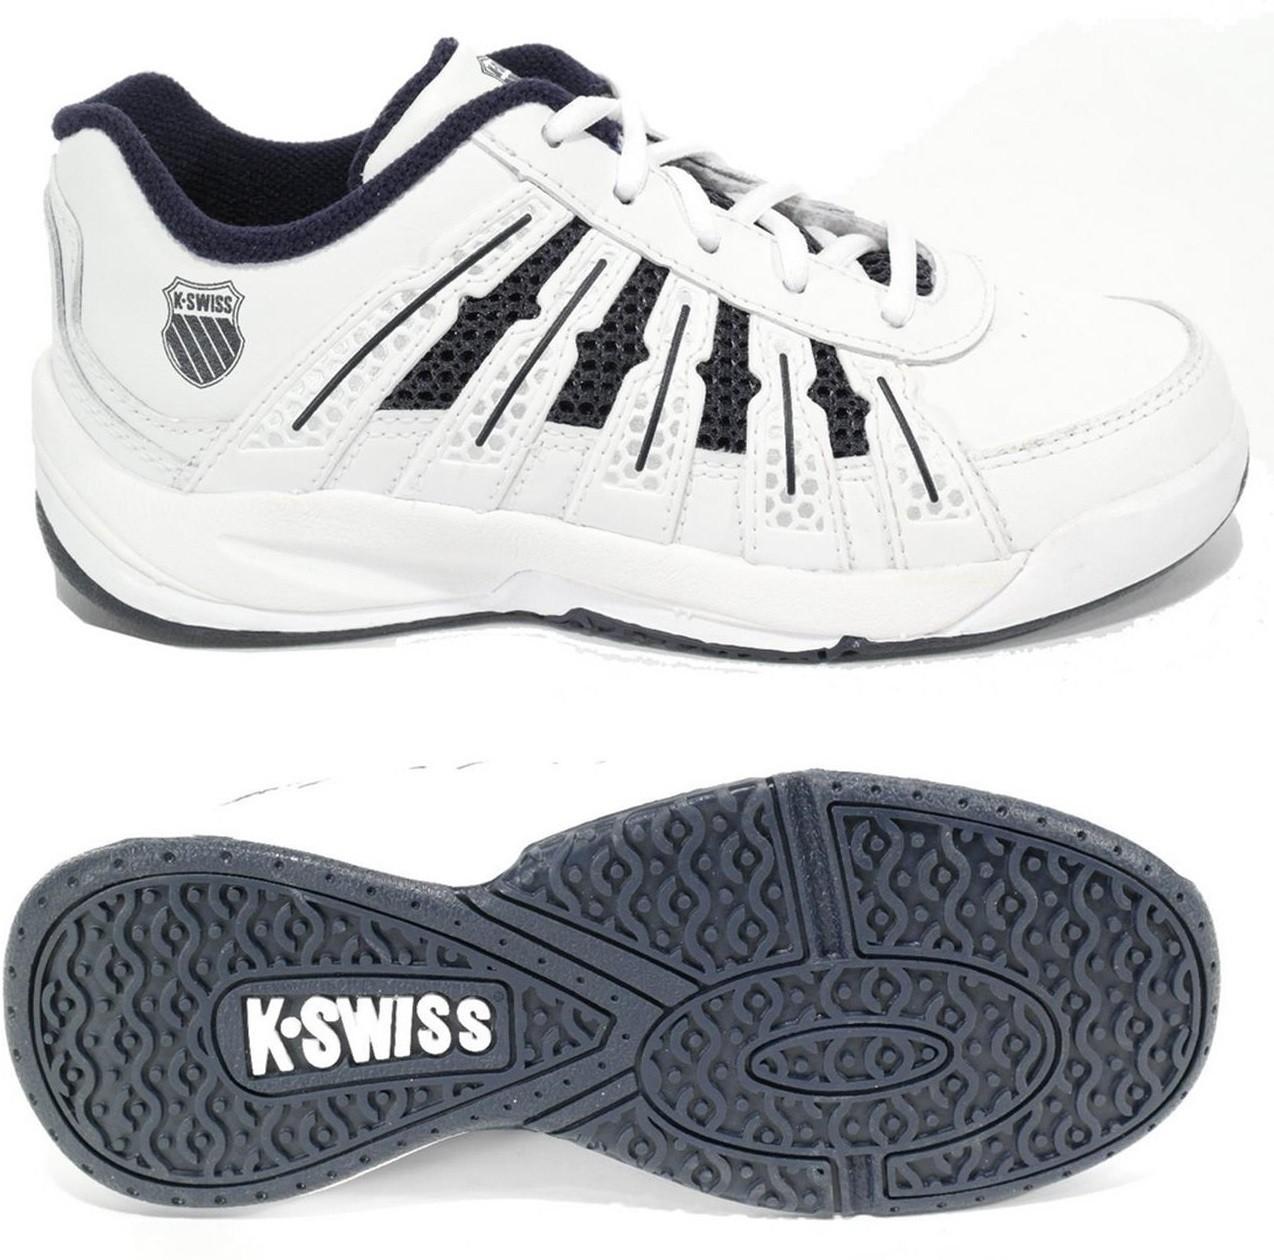 dětská tenisová obuv K-SWISS OPTIM II OMNI 82480167 71d363b20f